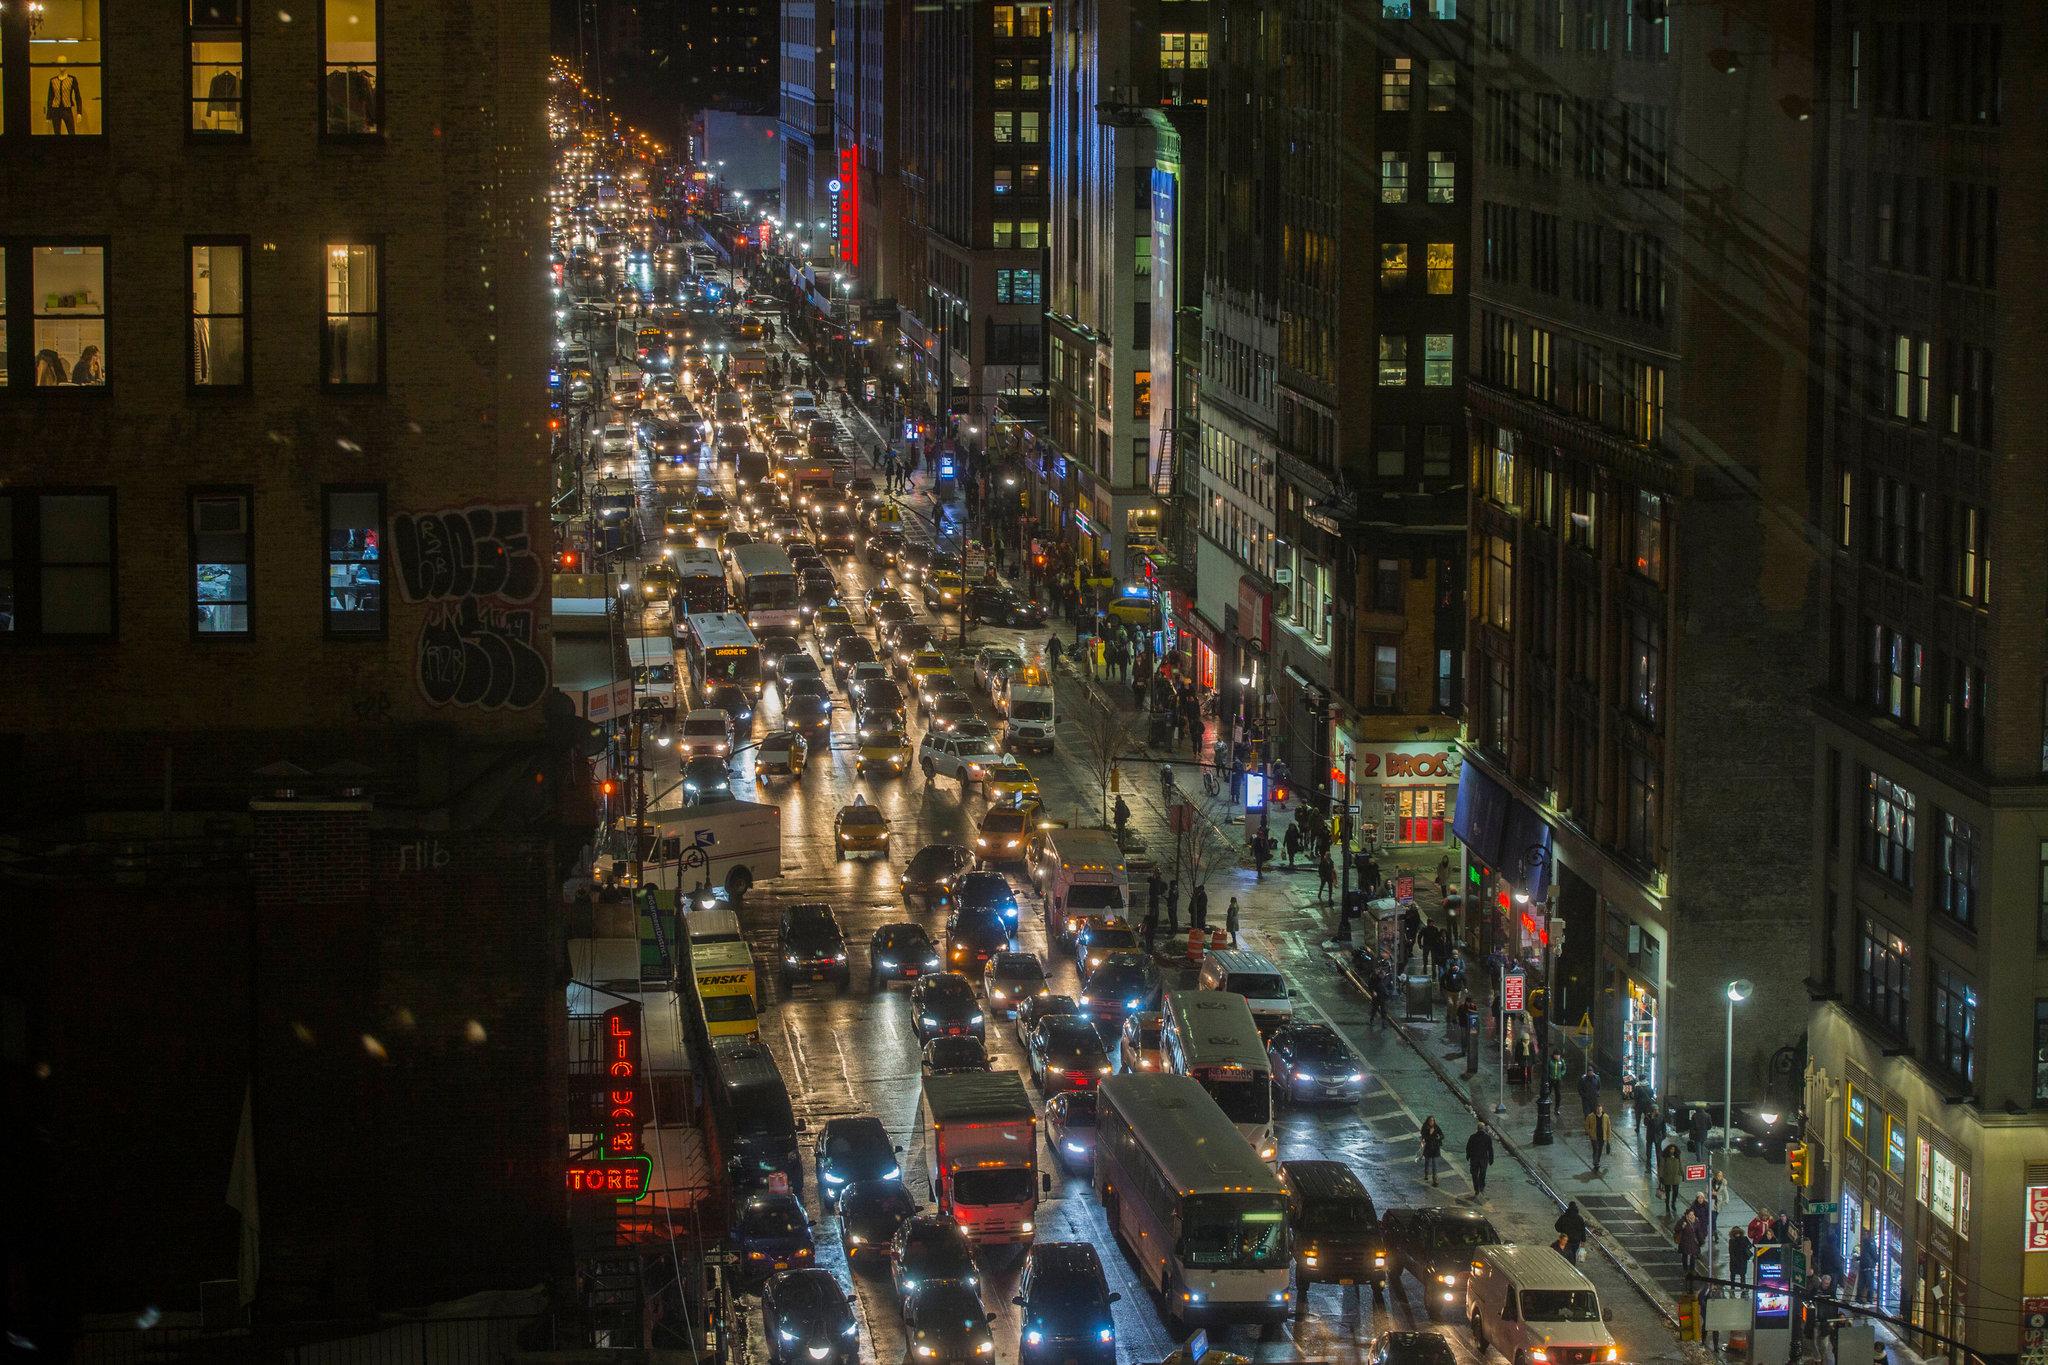 Una strada trafficata. Credit: Hiroko Masuike/The New York Times.